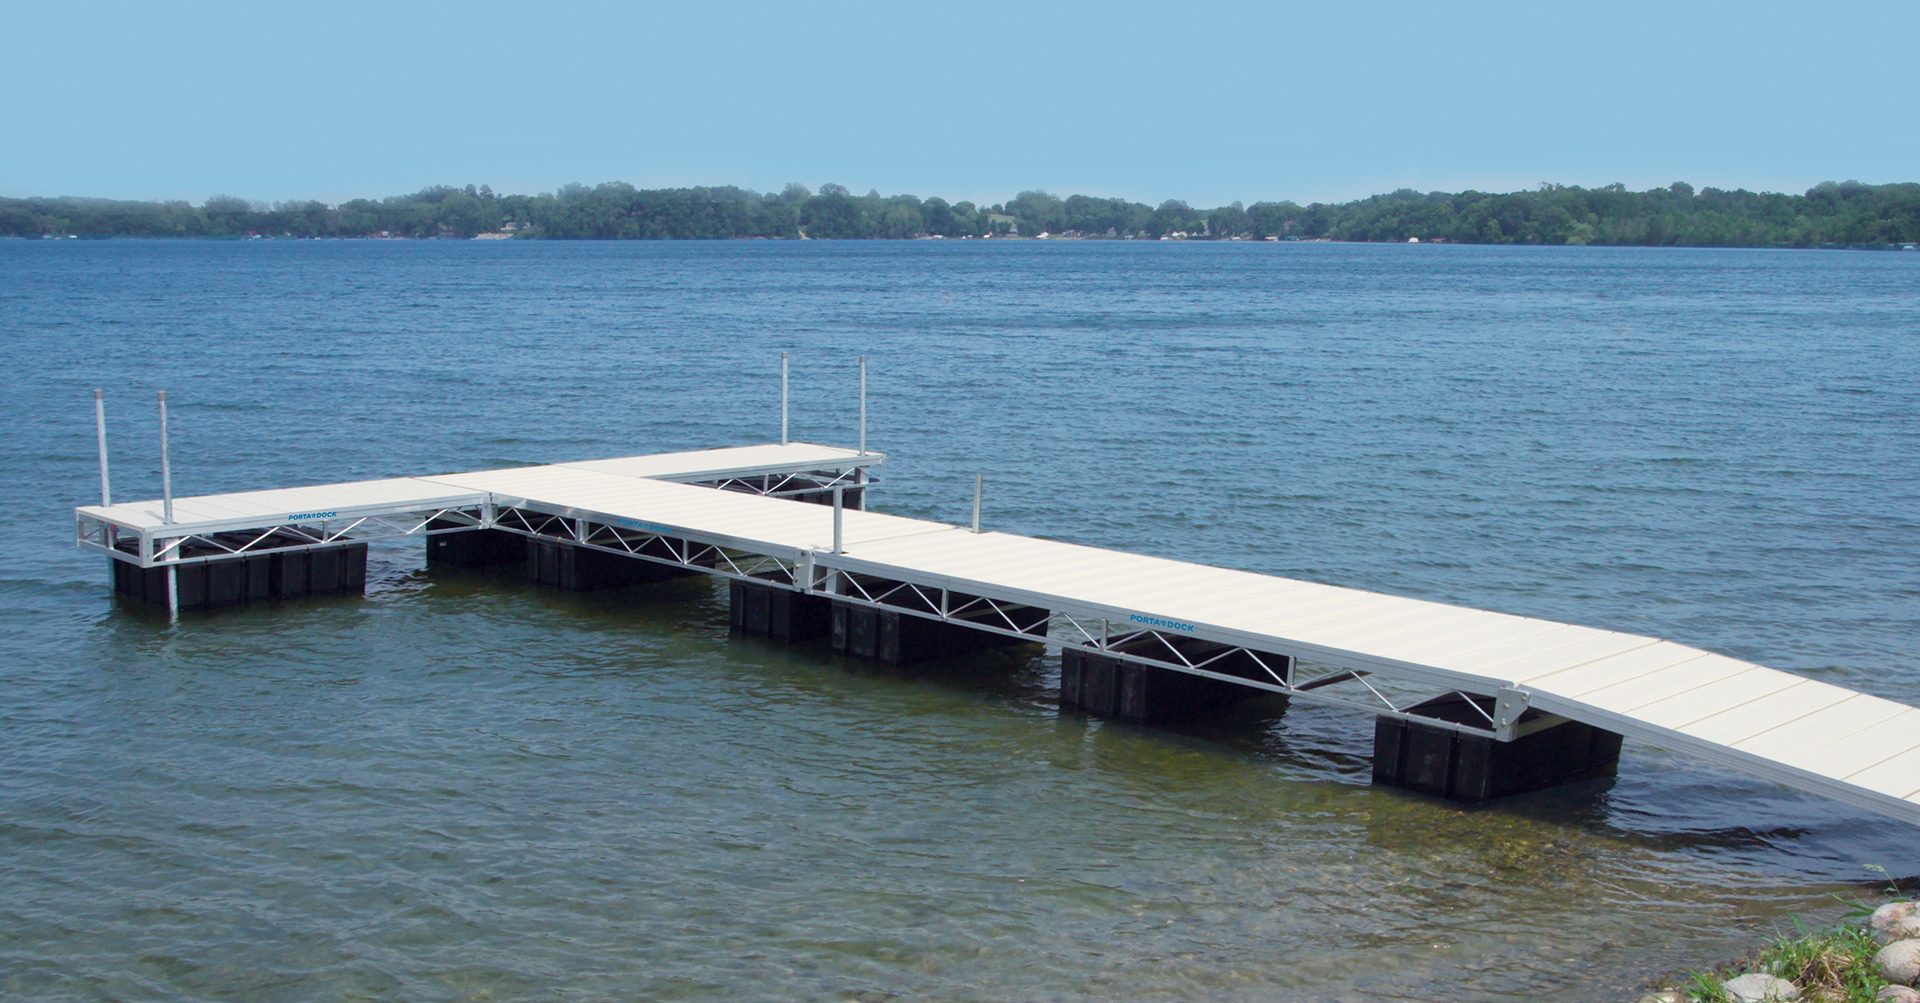 Porta-Dock floating dock on the lake